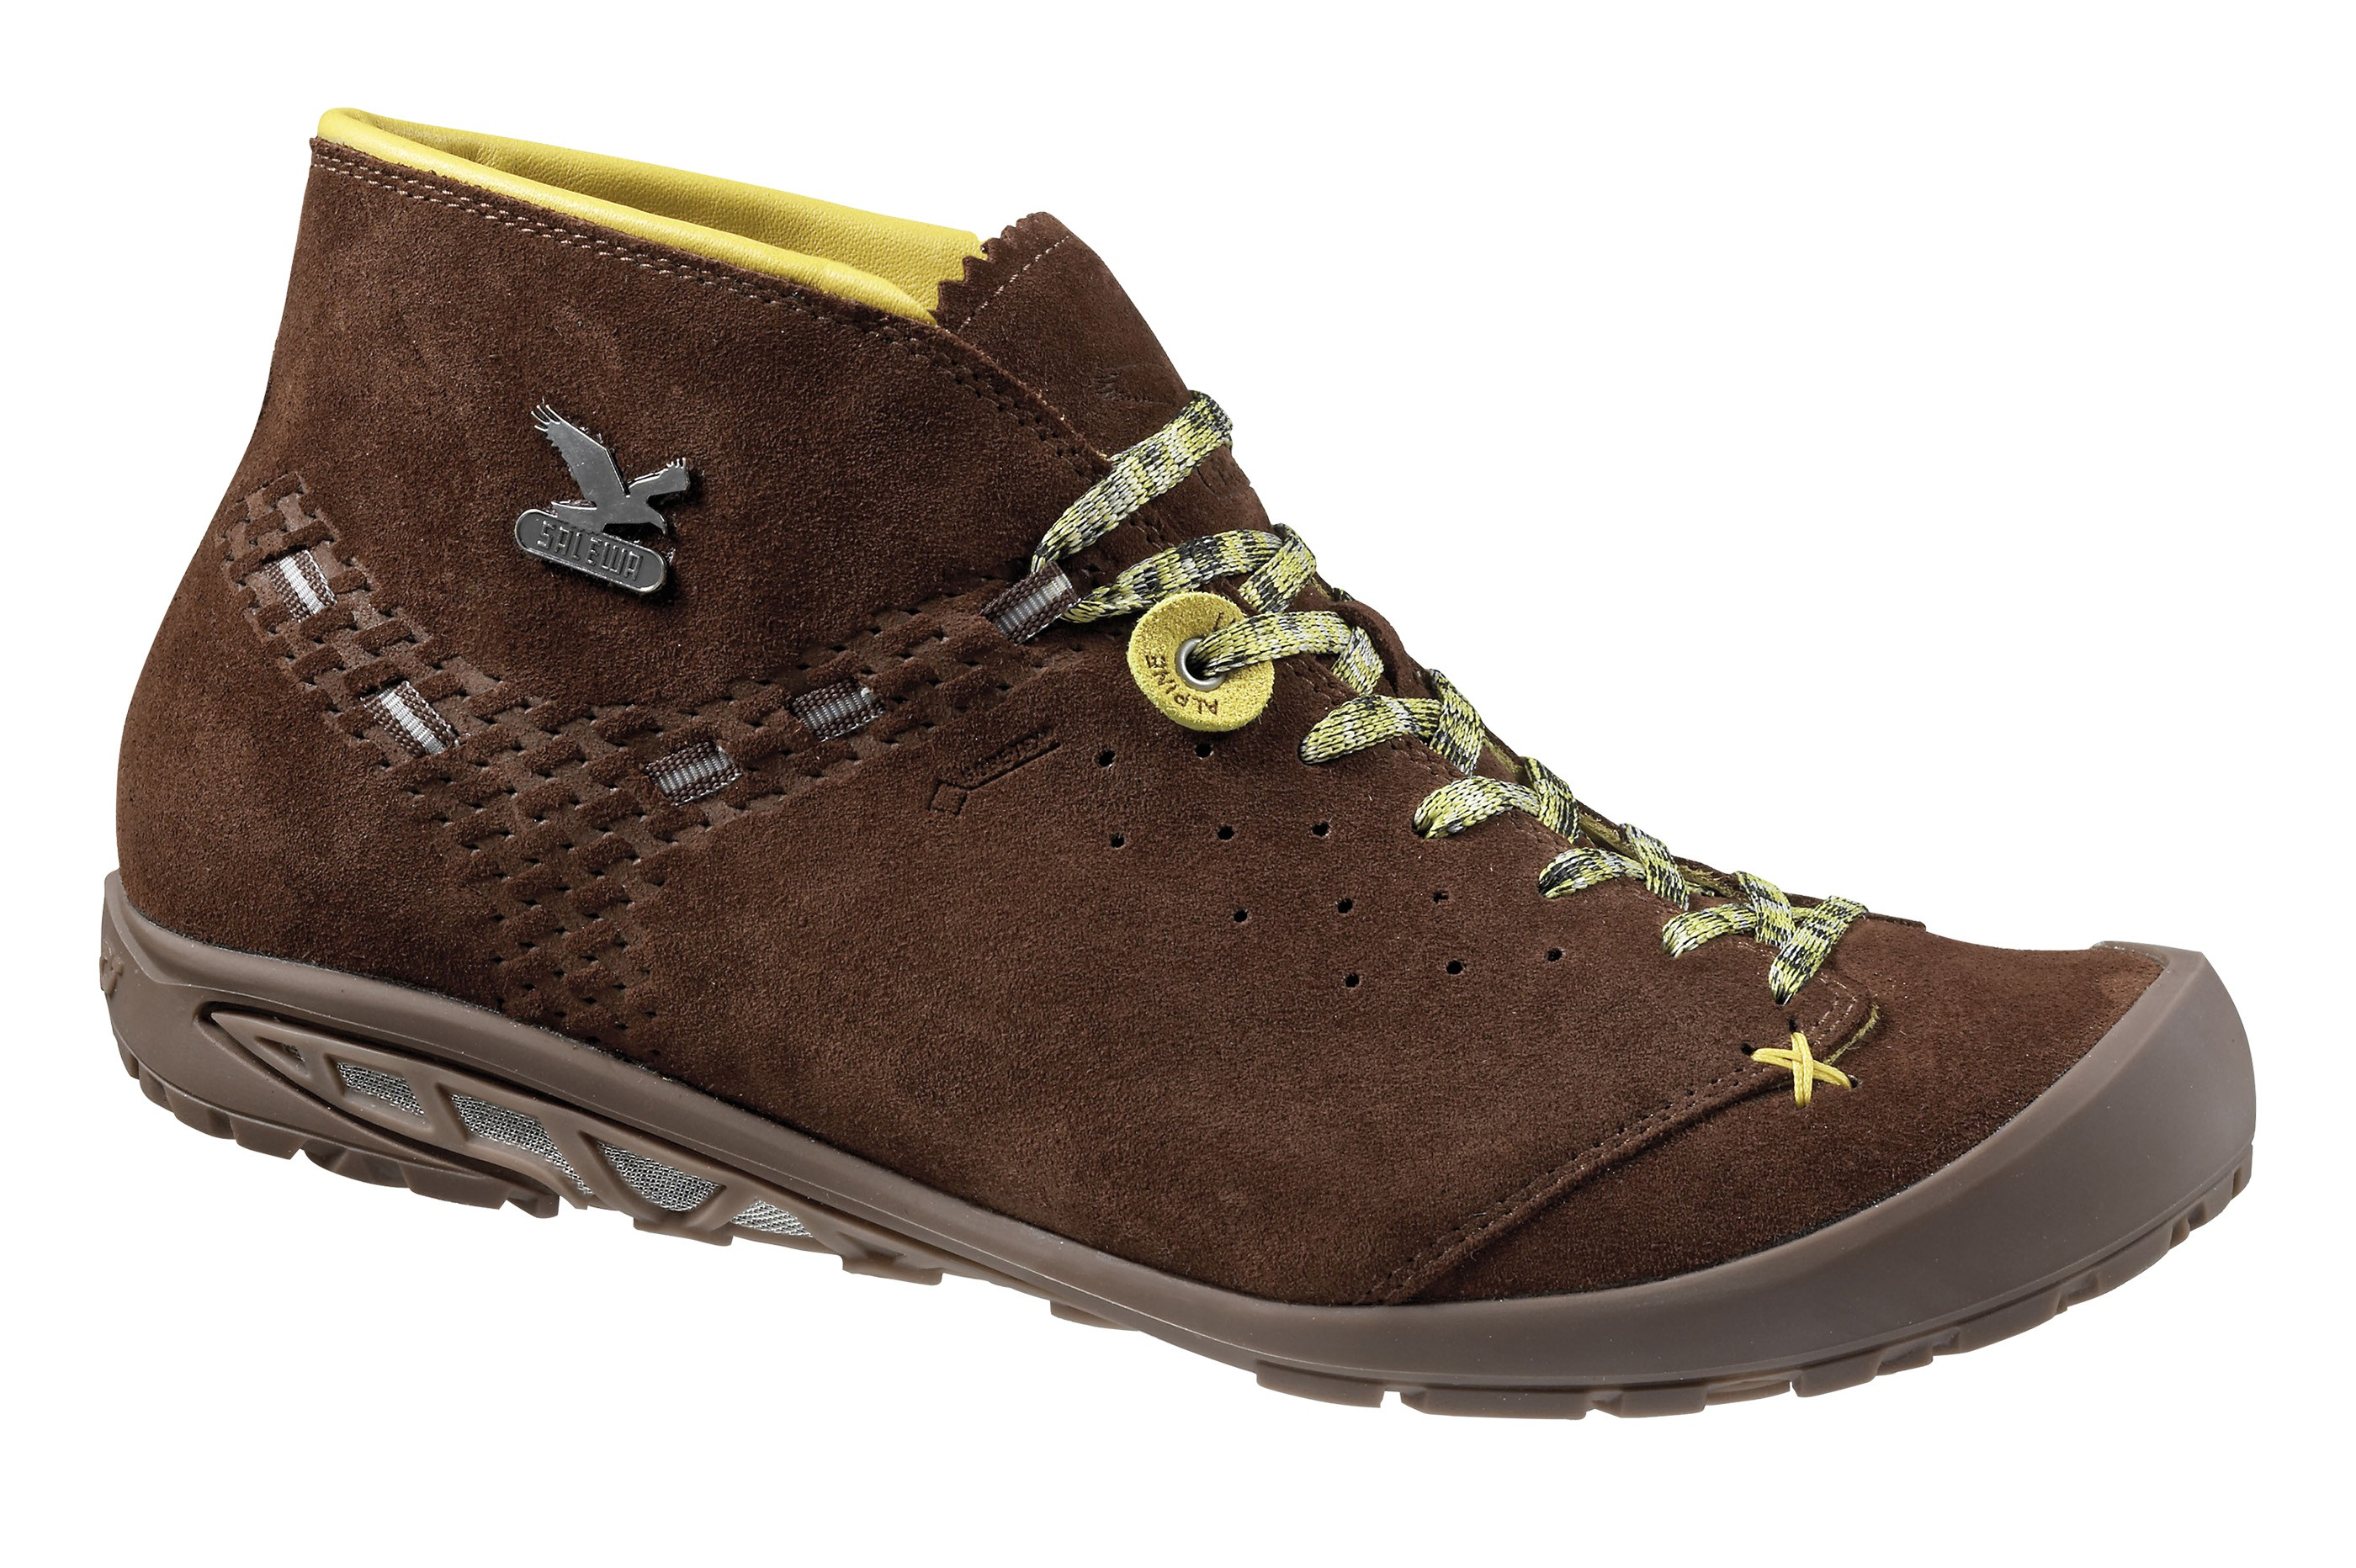 d491d2a5c743 Ботинки городские (высокие) Salewa Alpine Life MS ESCAPE MID GTX  Chocolate Gneiss